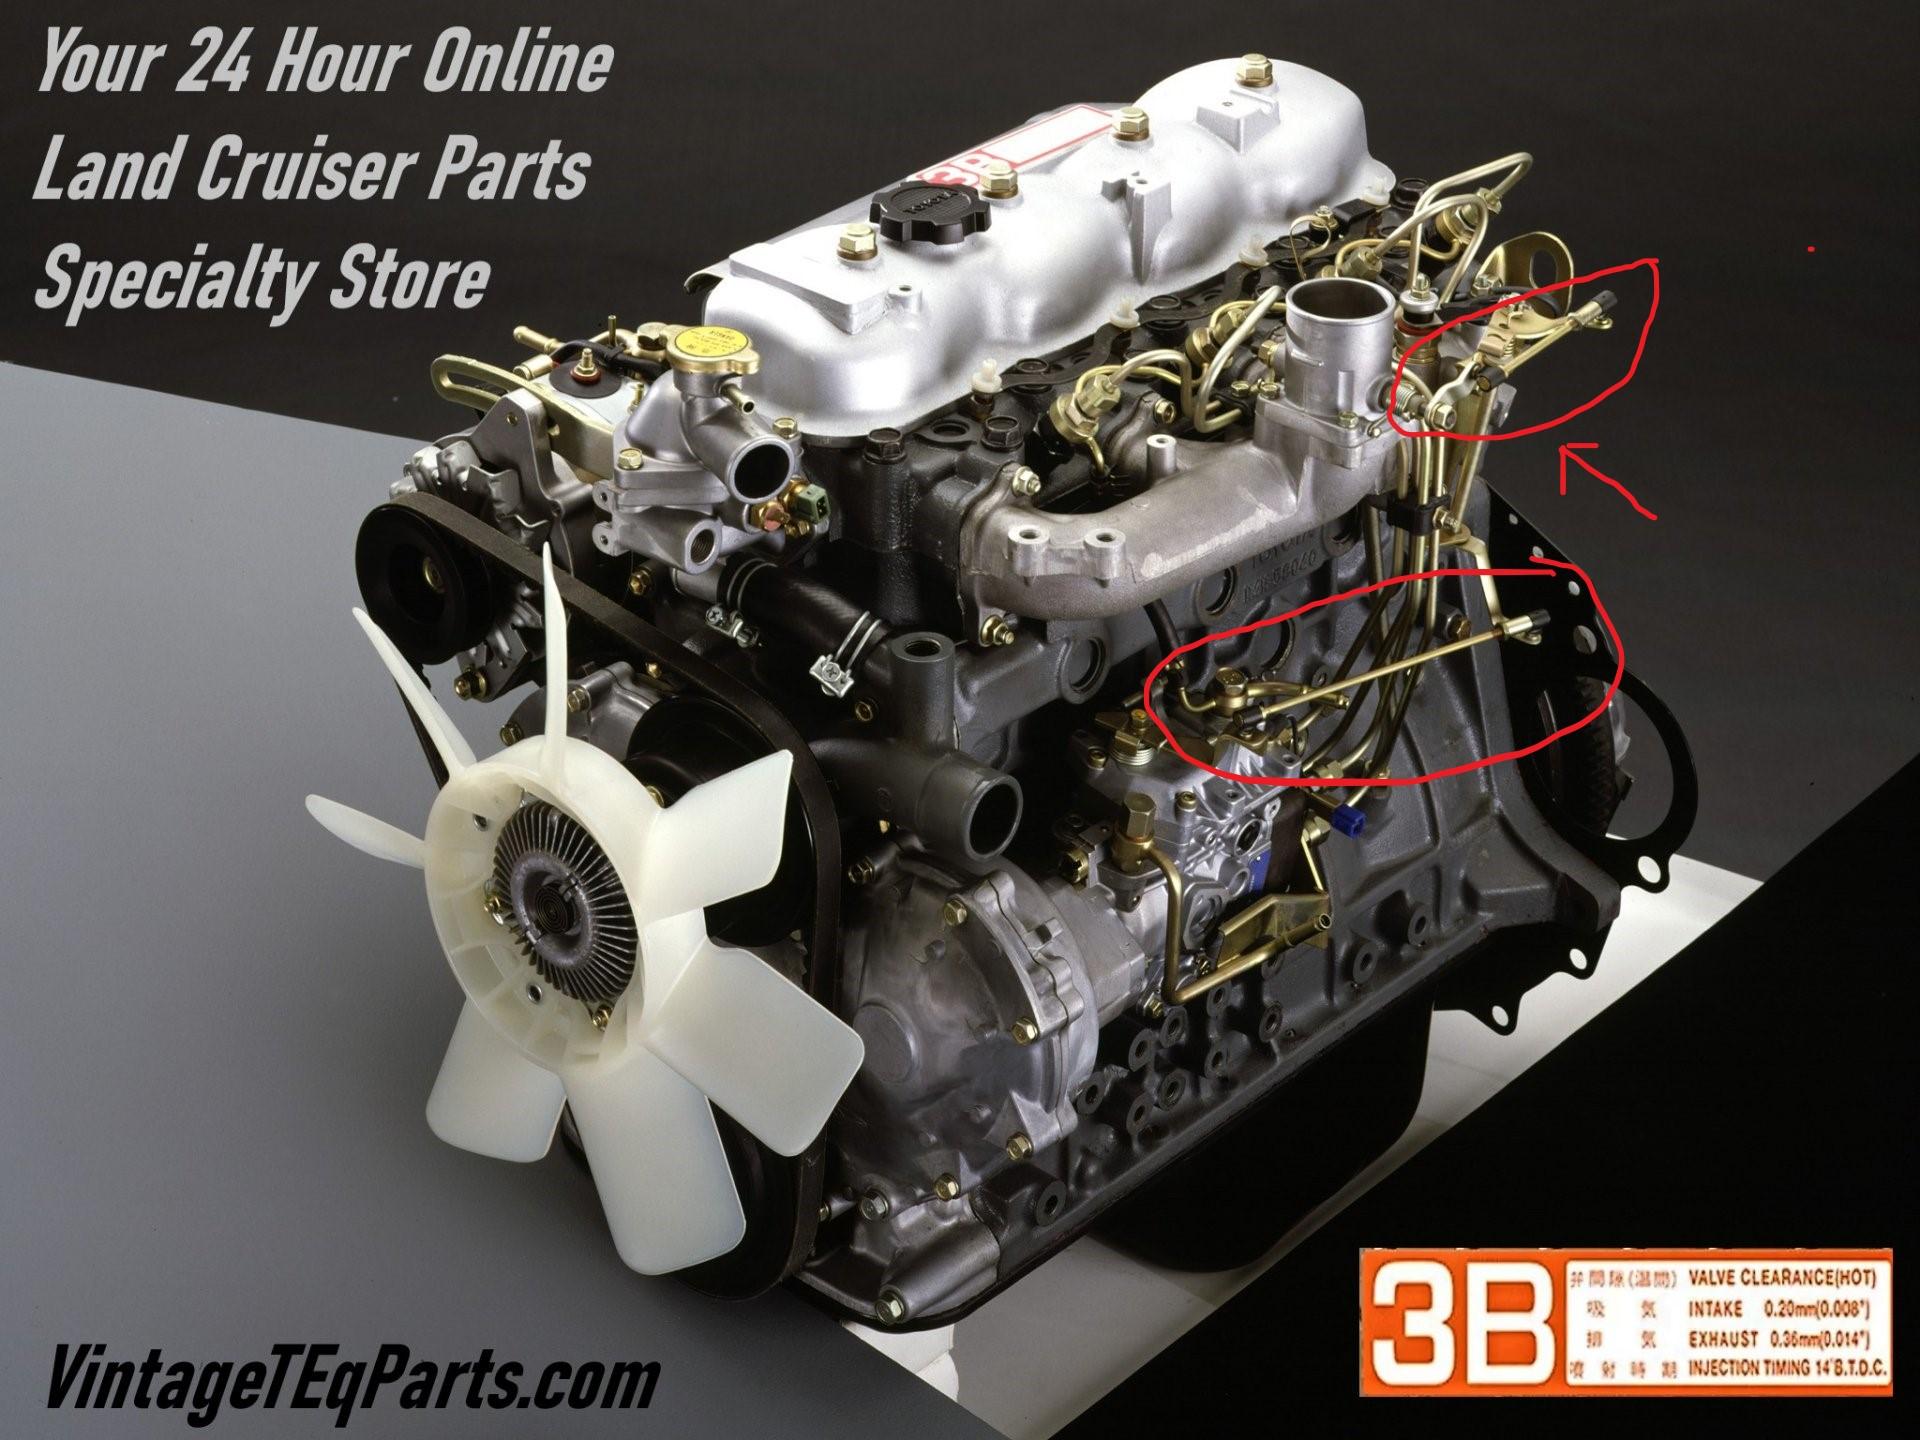 toyota-3B-engine1 - Copy.jpg